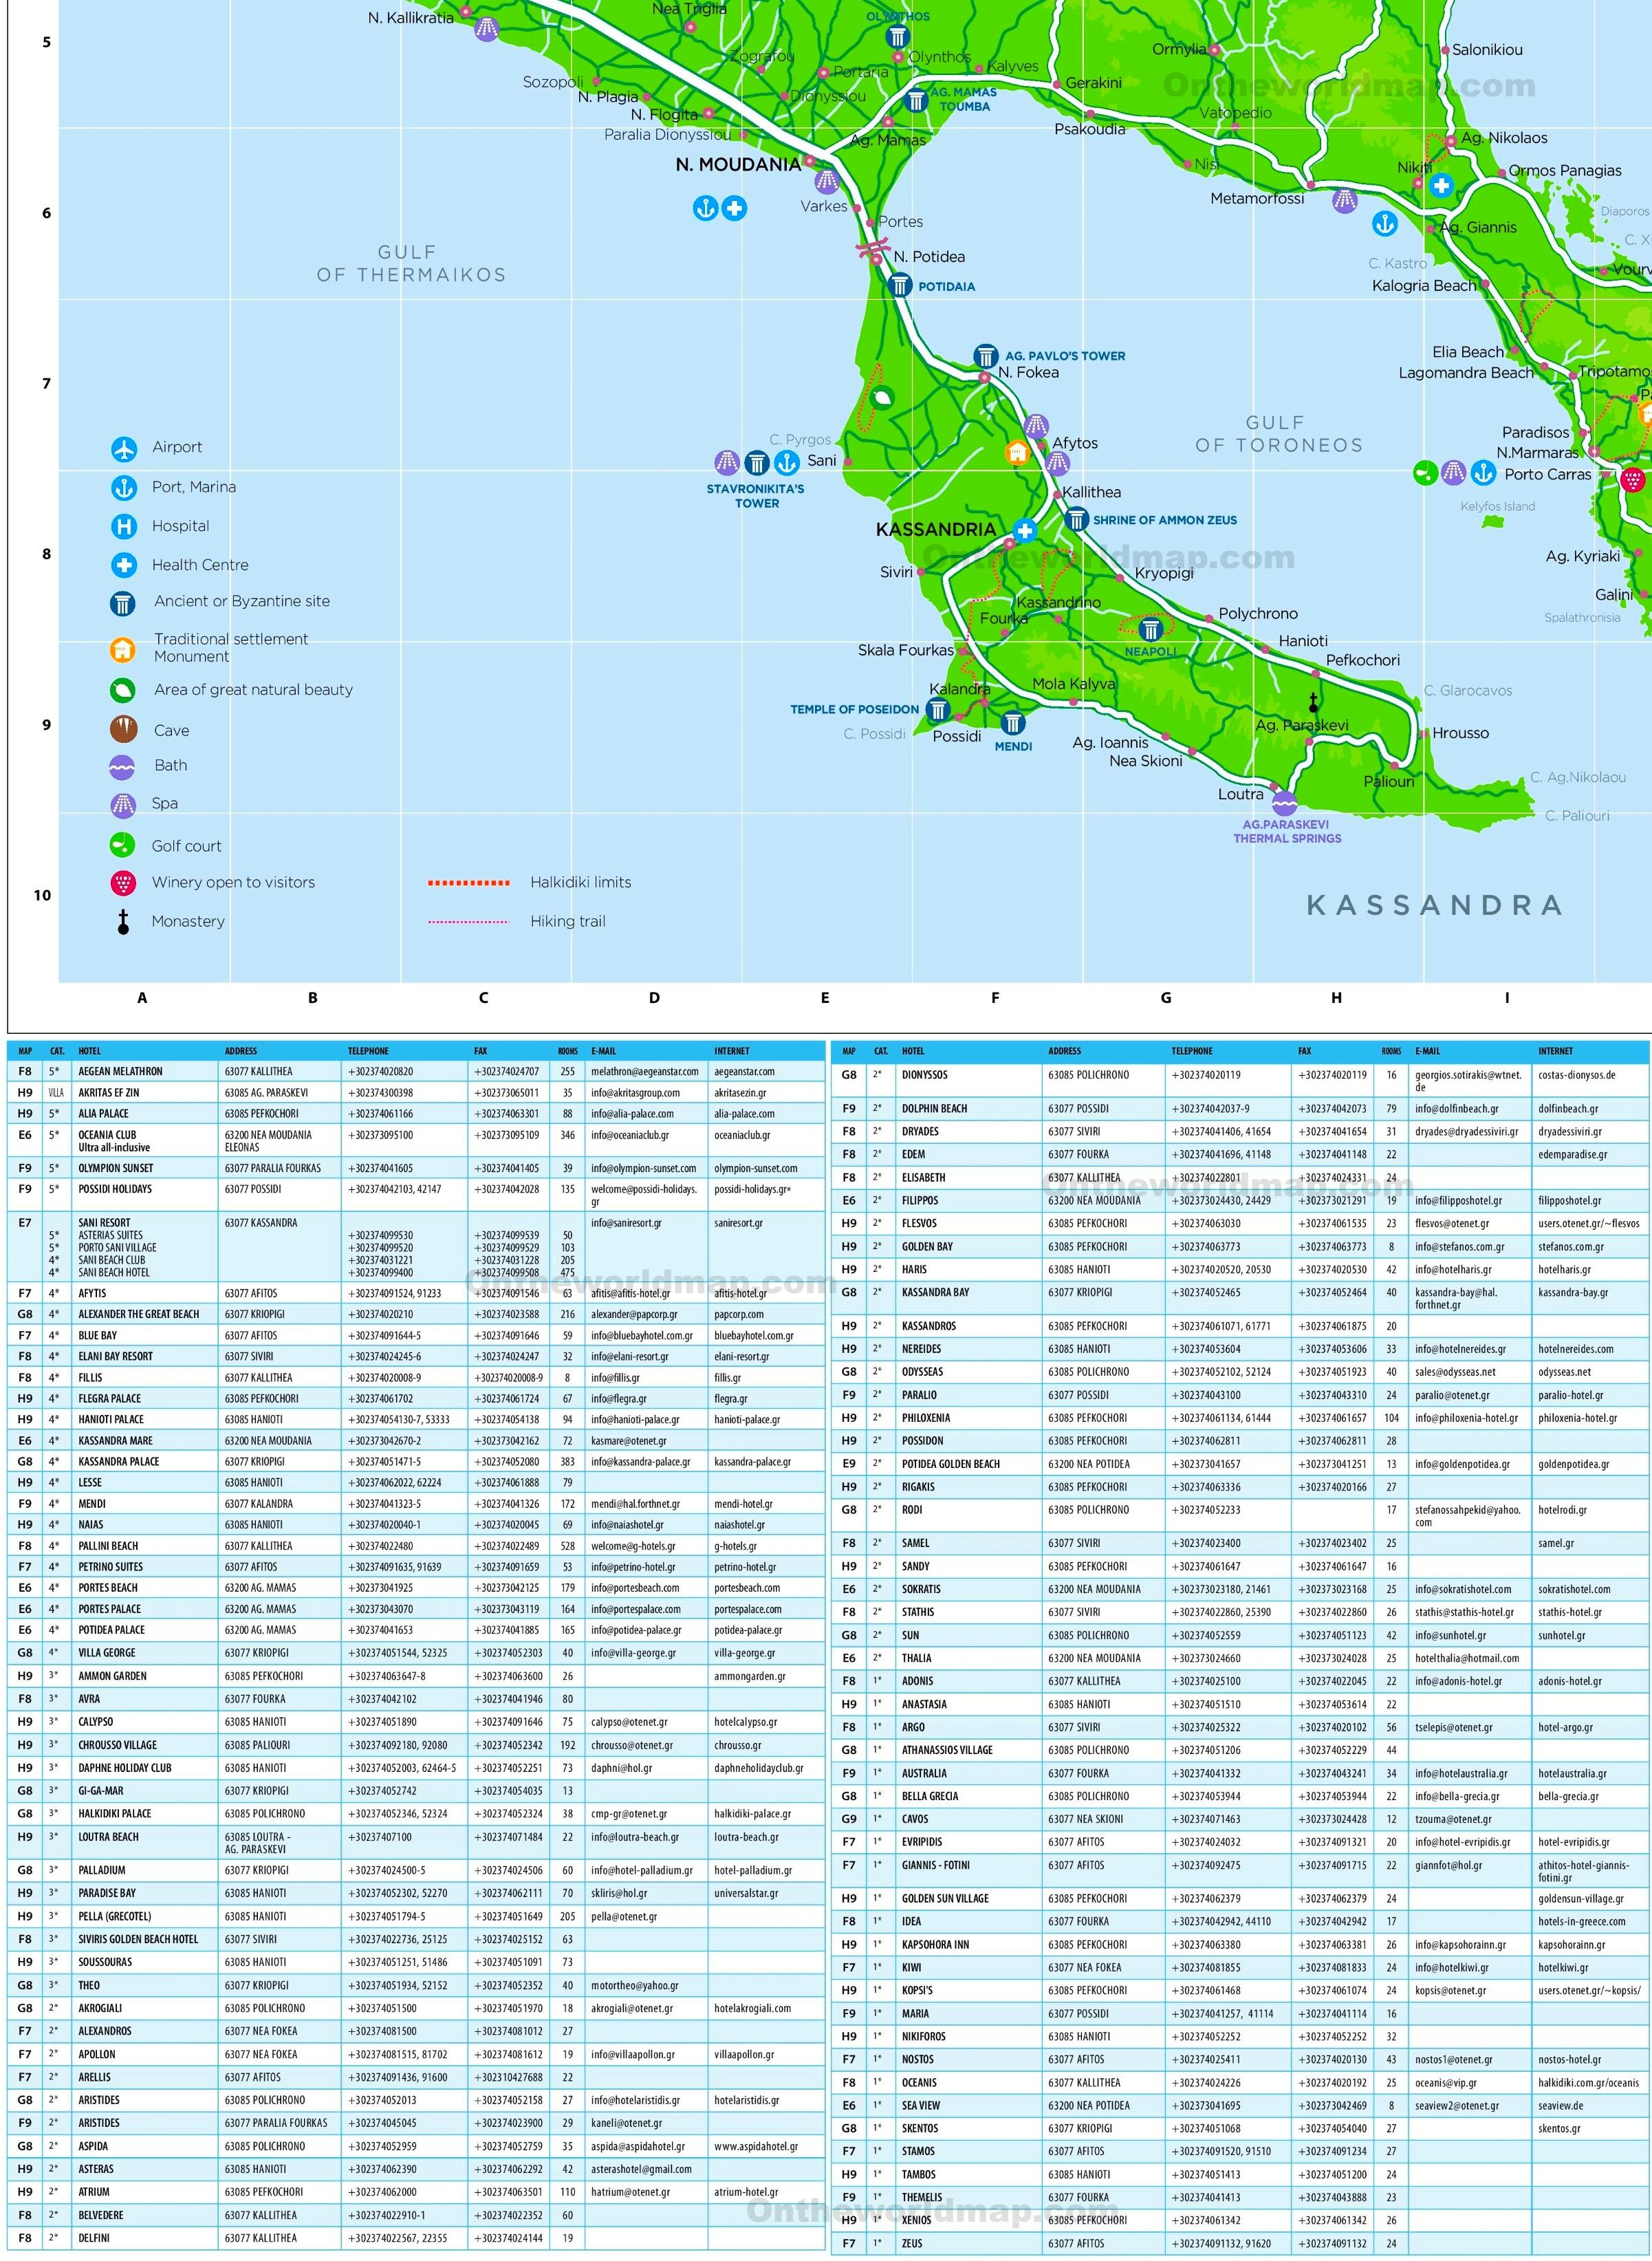 Kasandra Mapa Svet Putovanja